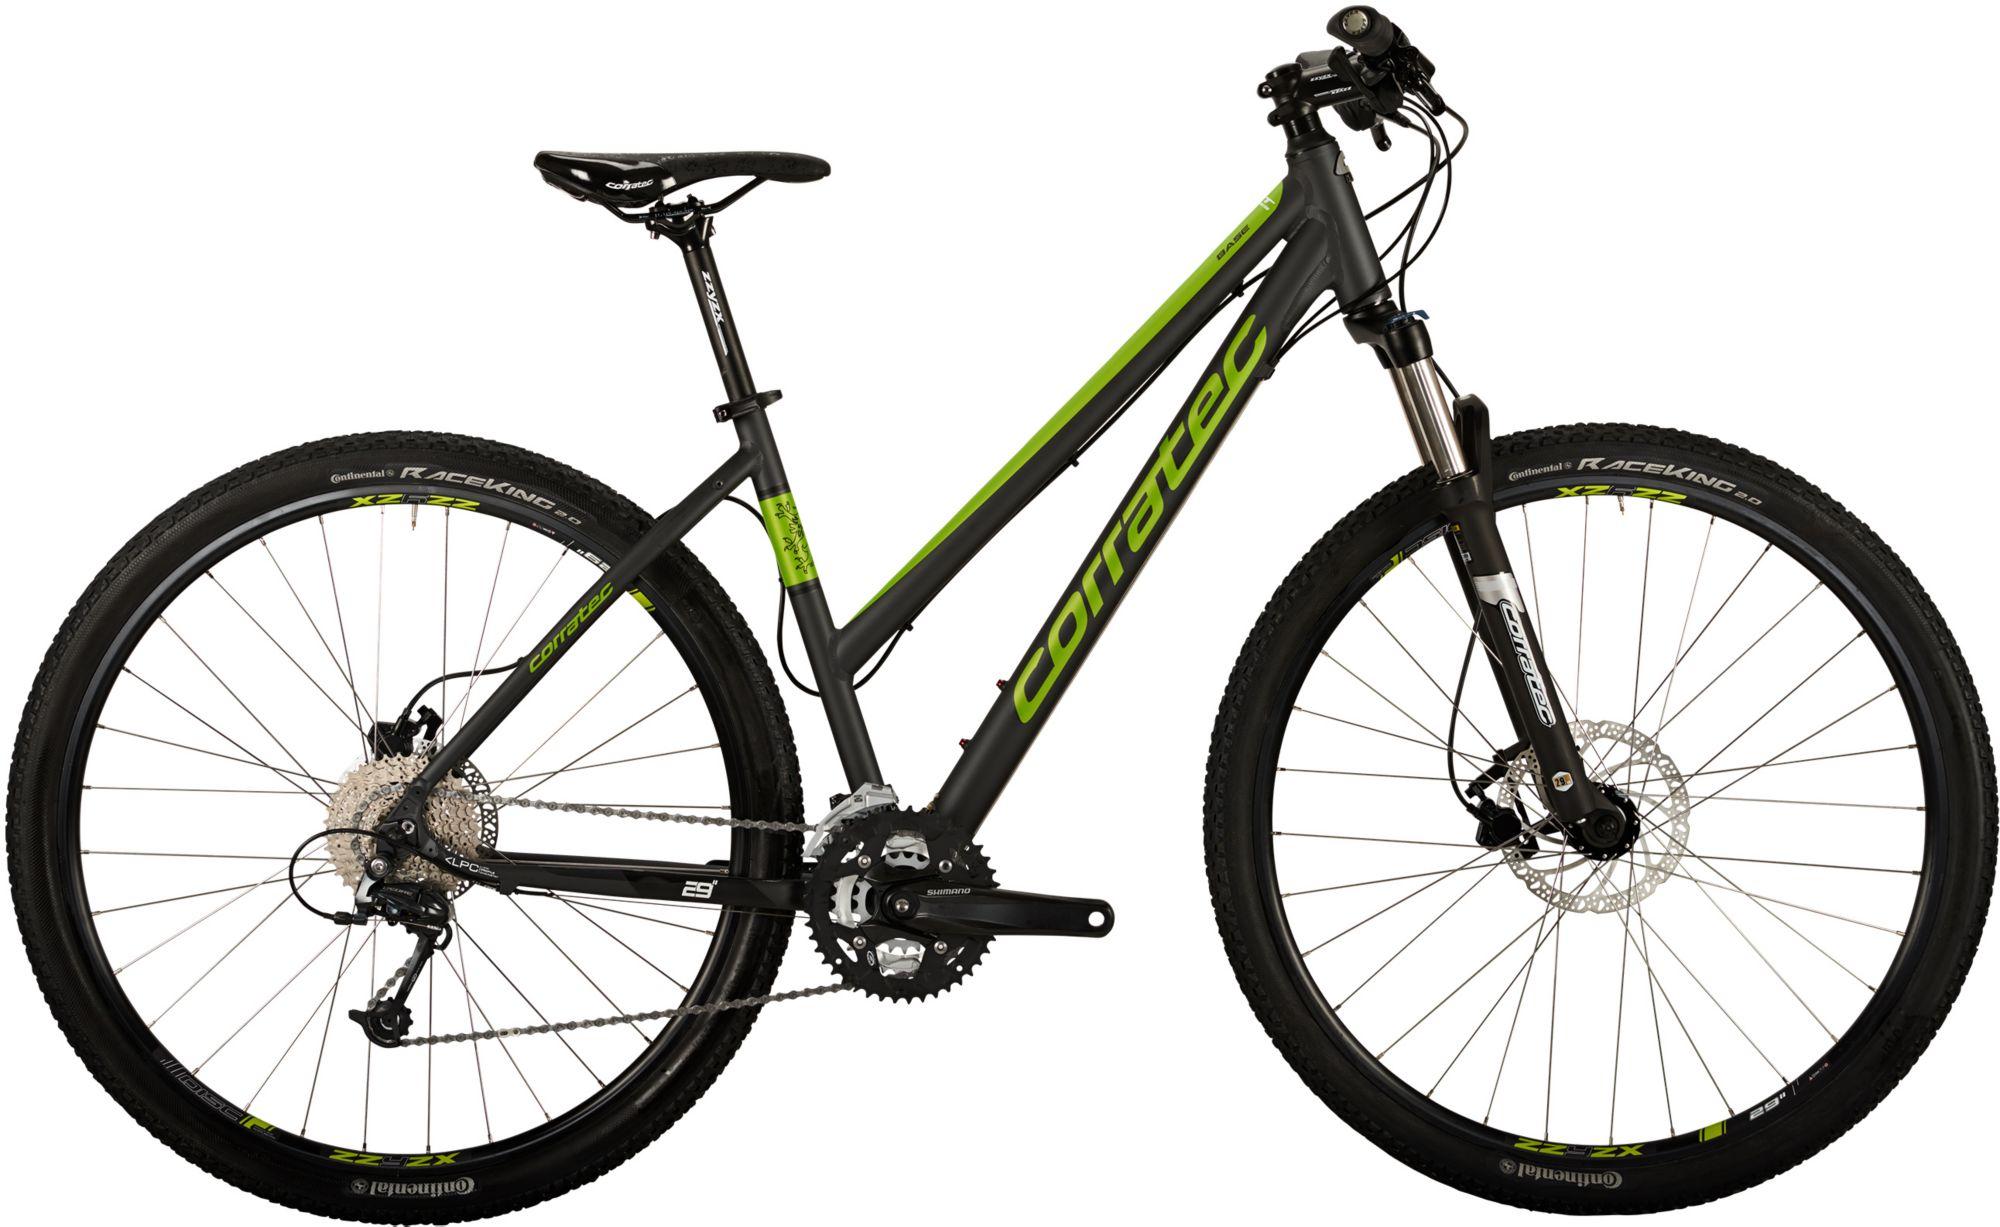 CORRATEC Corratec Hardtail Mountainbike, 29 Zoll, 27 Gang Shimano Deore, »MT CROSS Base Lady«